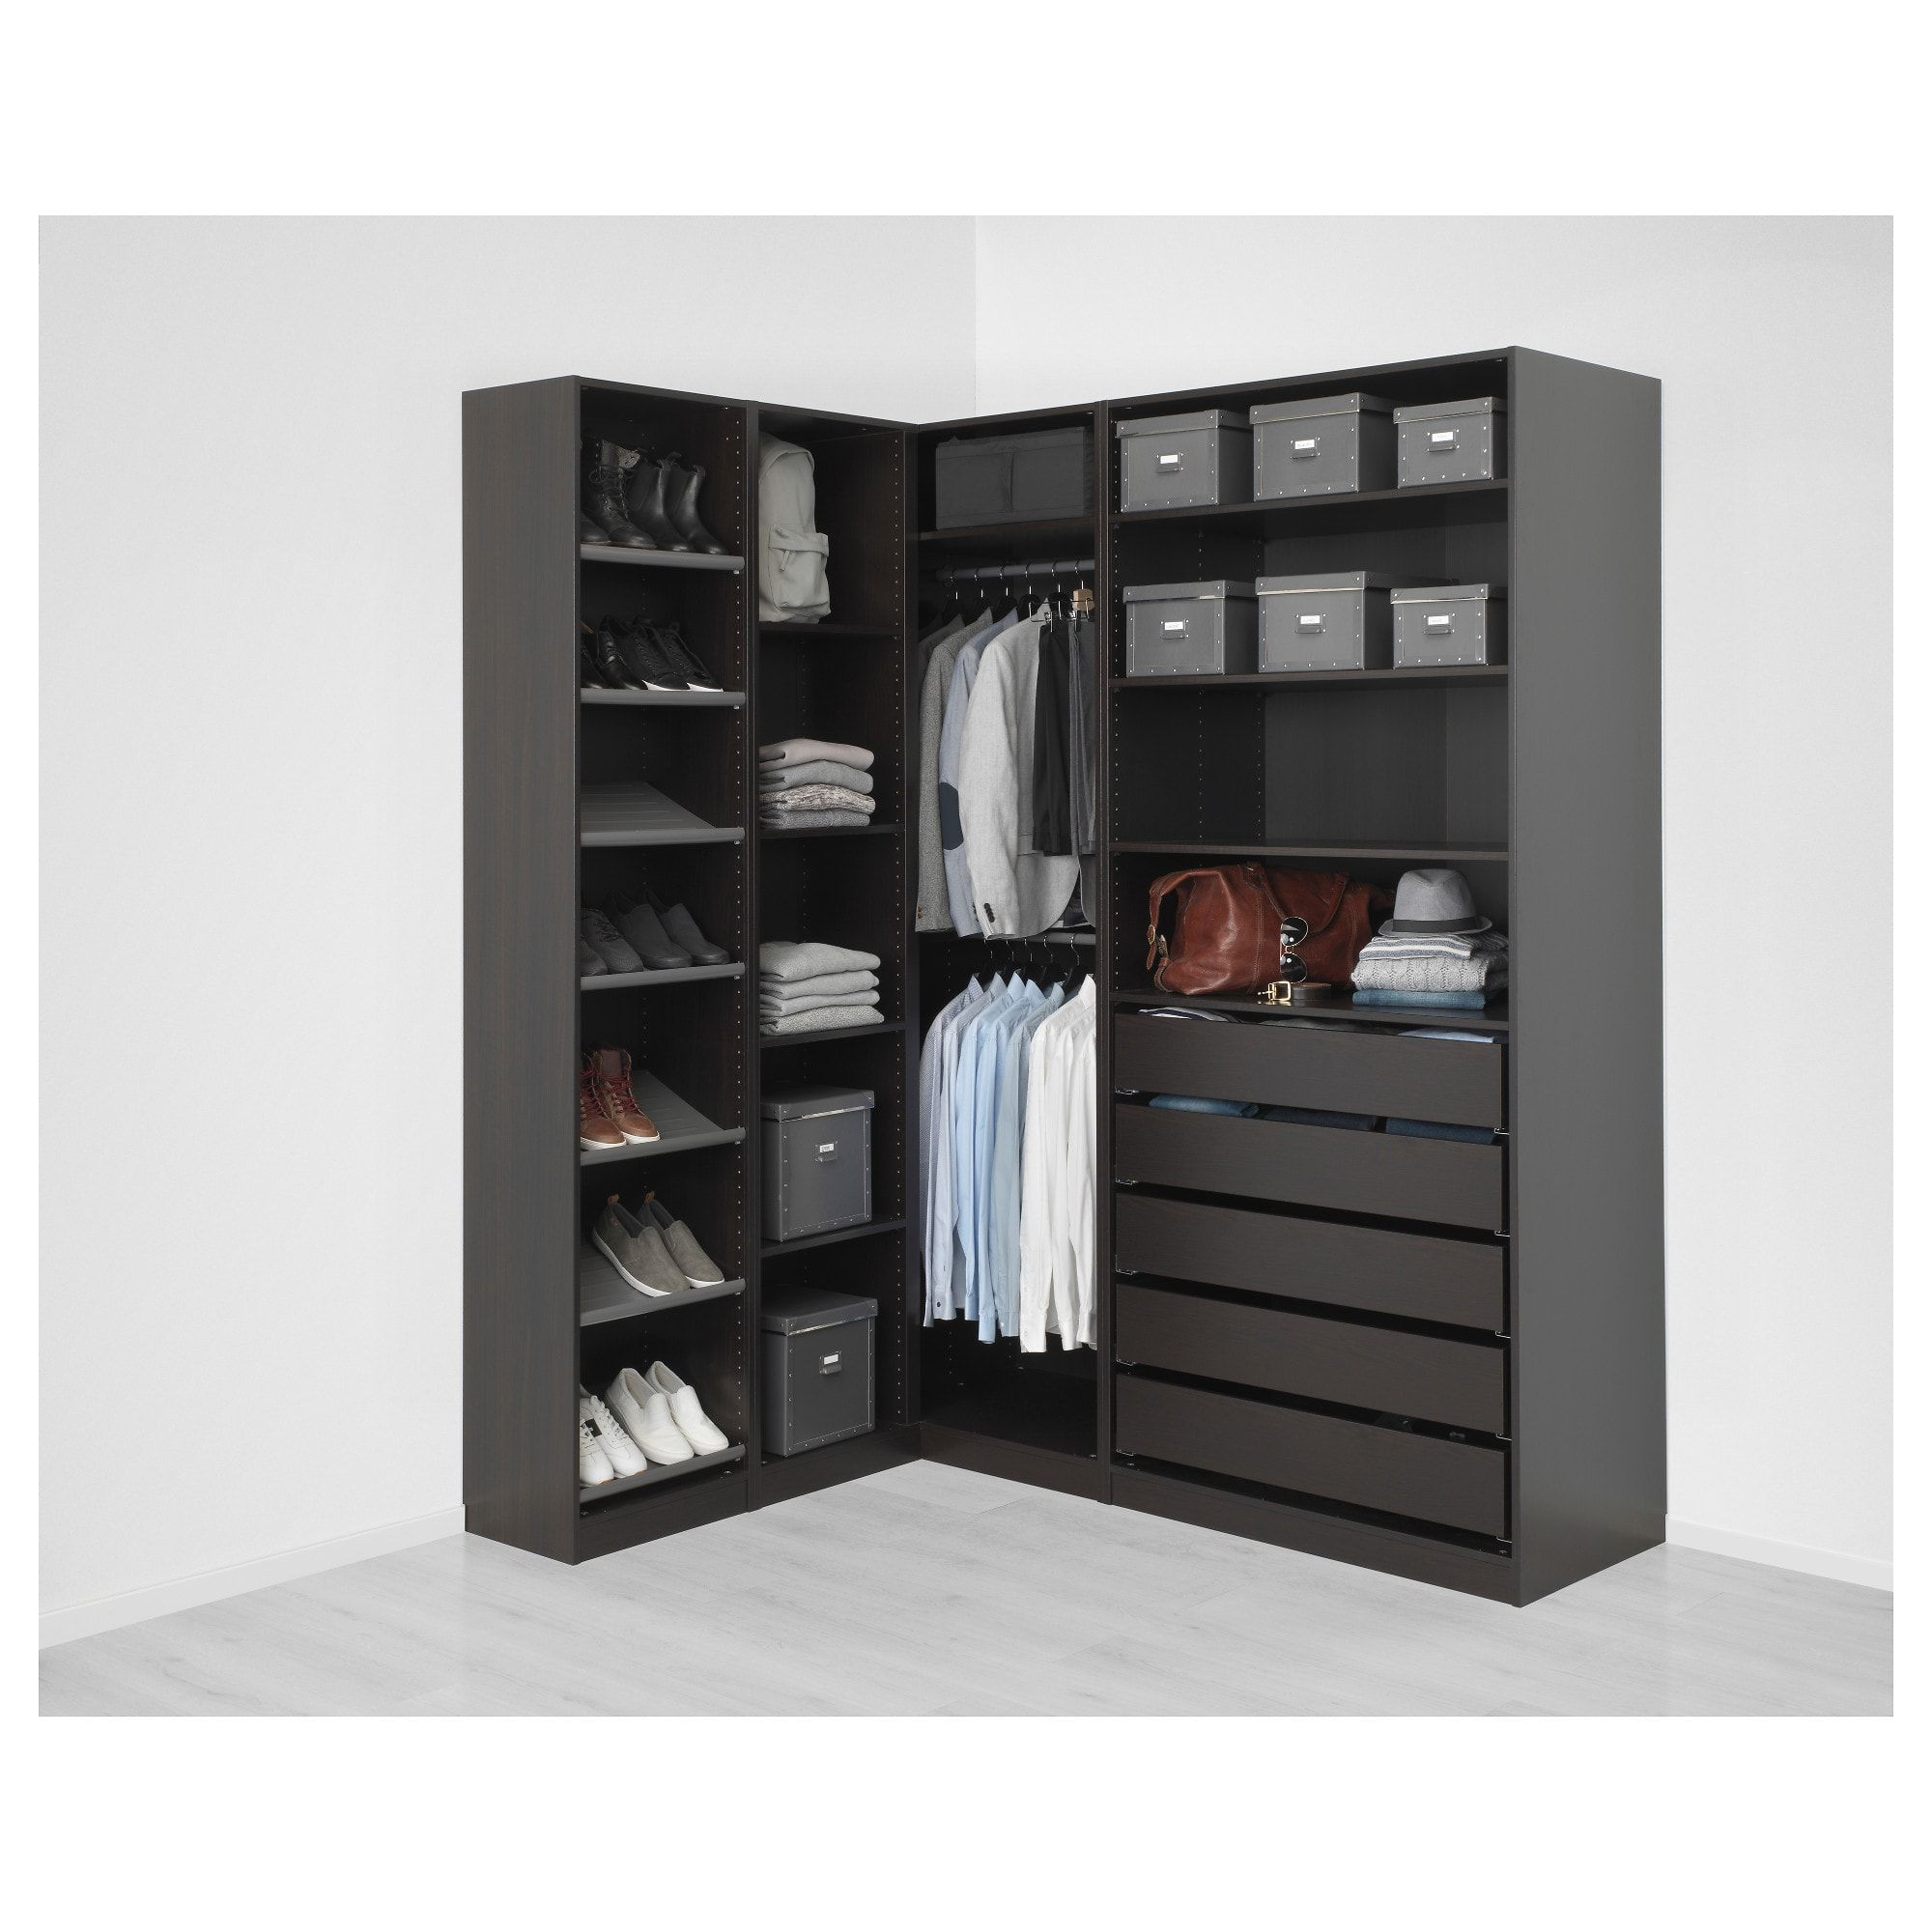 Pax Corner Wardrobe Black Brown 63 1 8 73 7 8x93 1 8 Ikea Corner Wardrobe Pax Corner Wardrobe Ikea Pax Corner Wardrobe